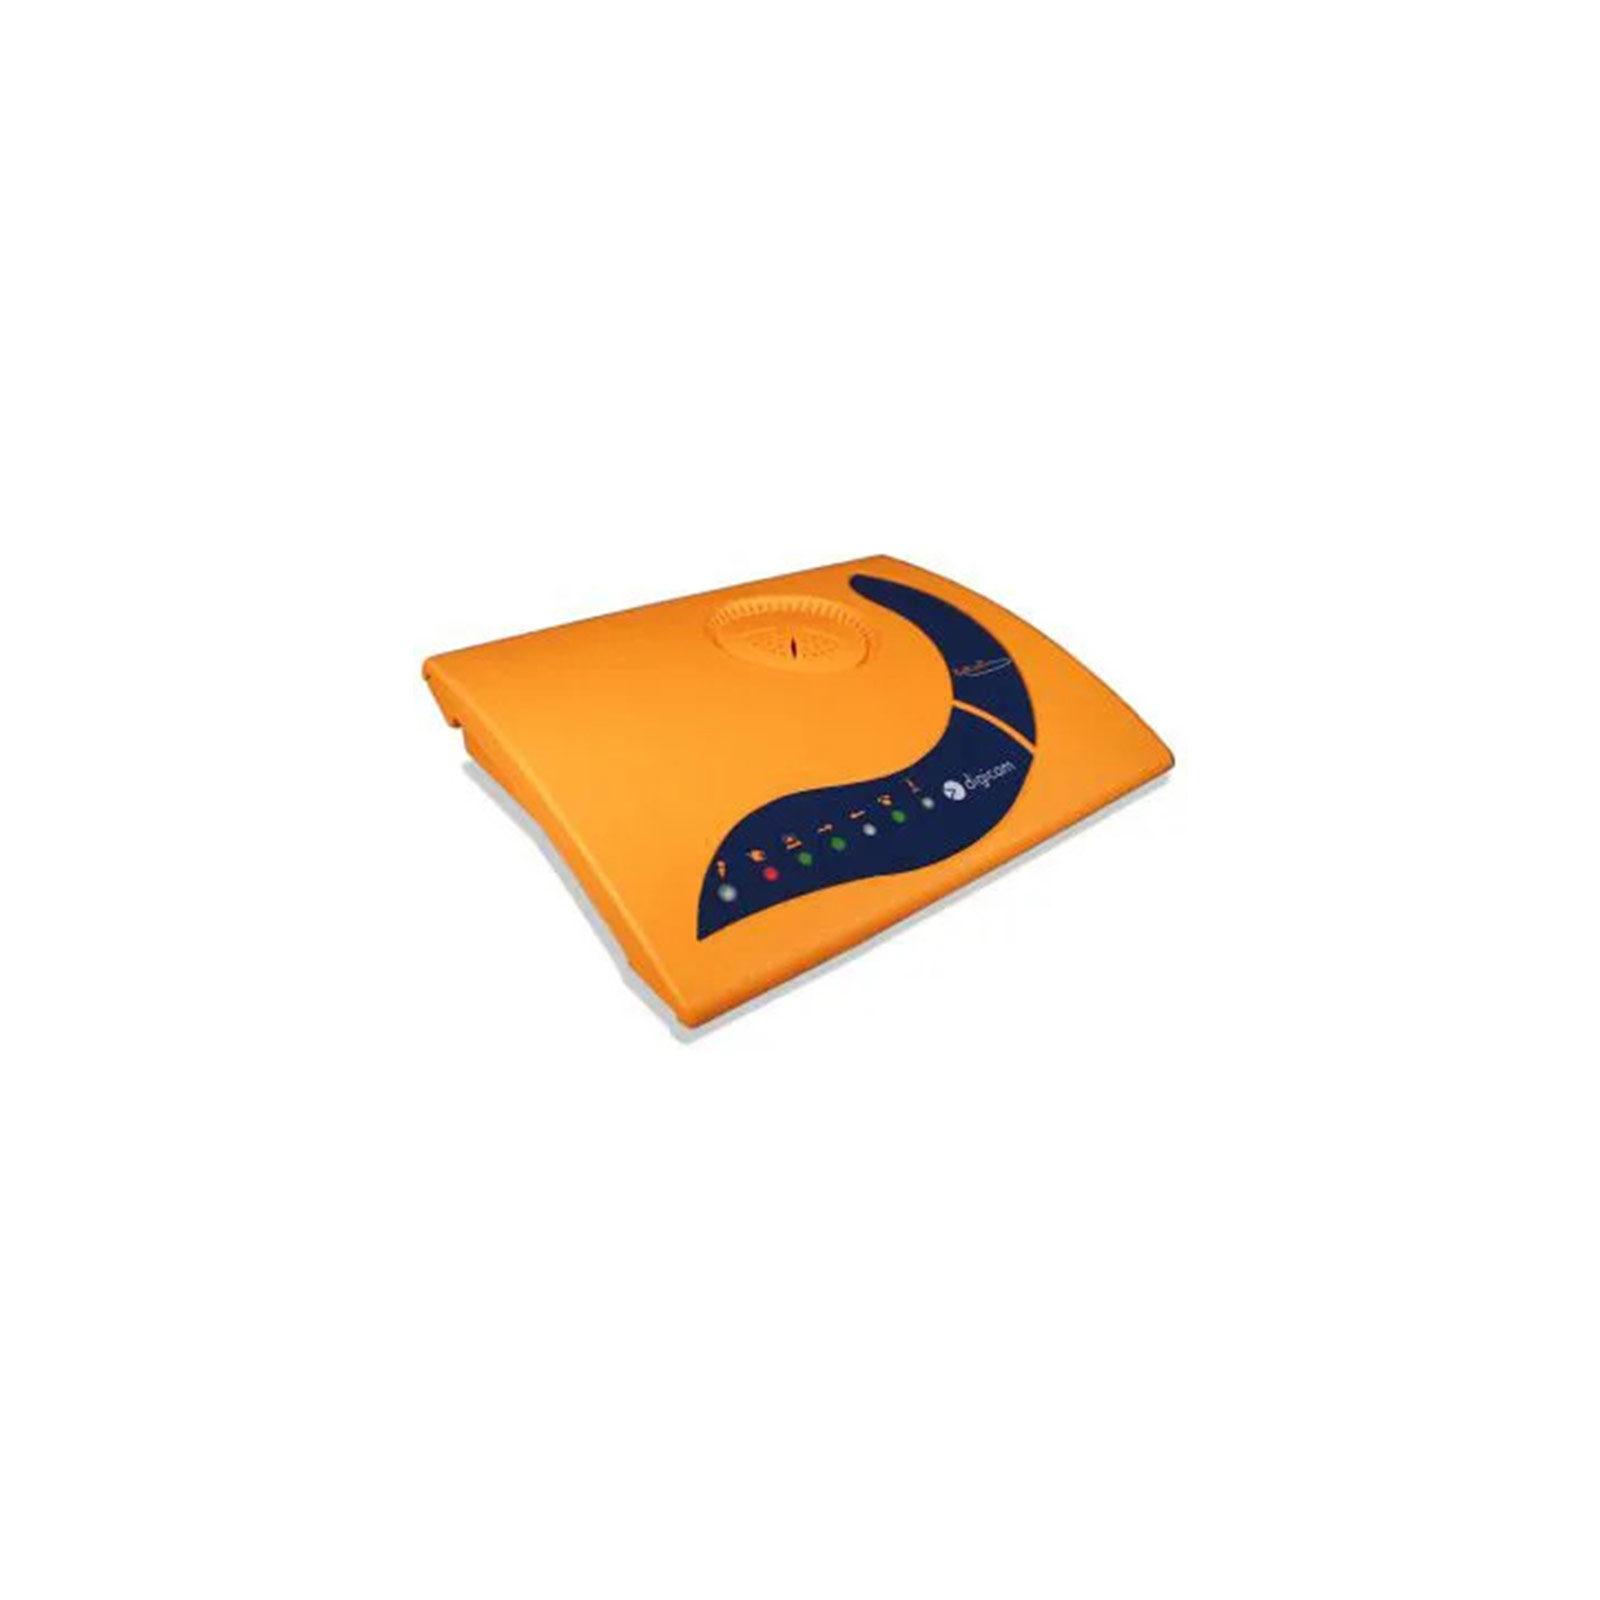 modem-analogico-pstn-seriale-sistema